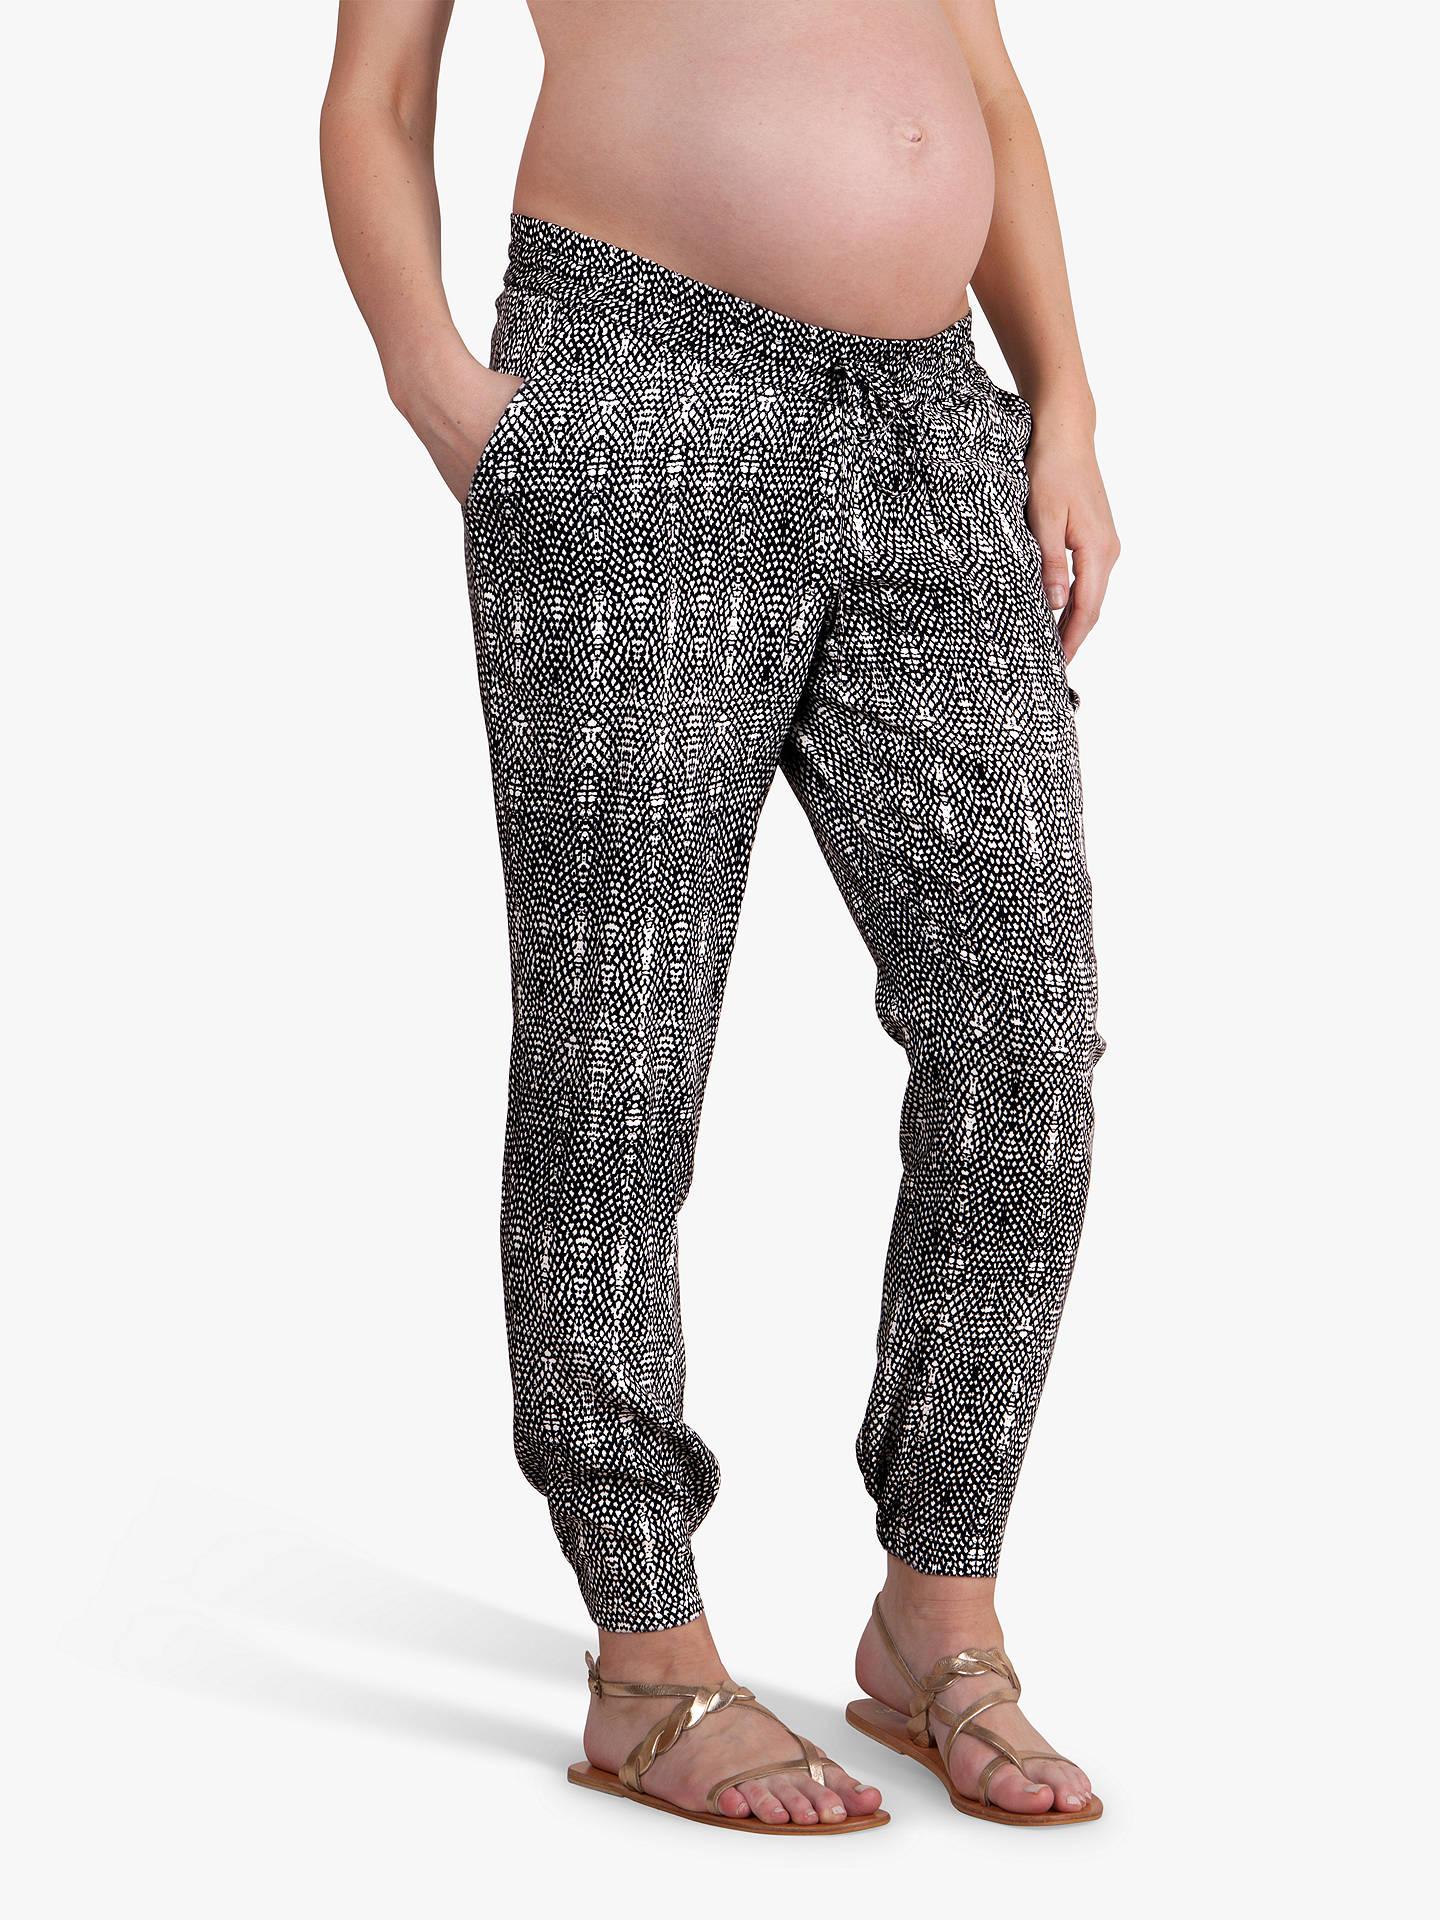 bc55809cec8 Séraphine Abel Maternity Trousers, Black/White